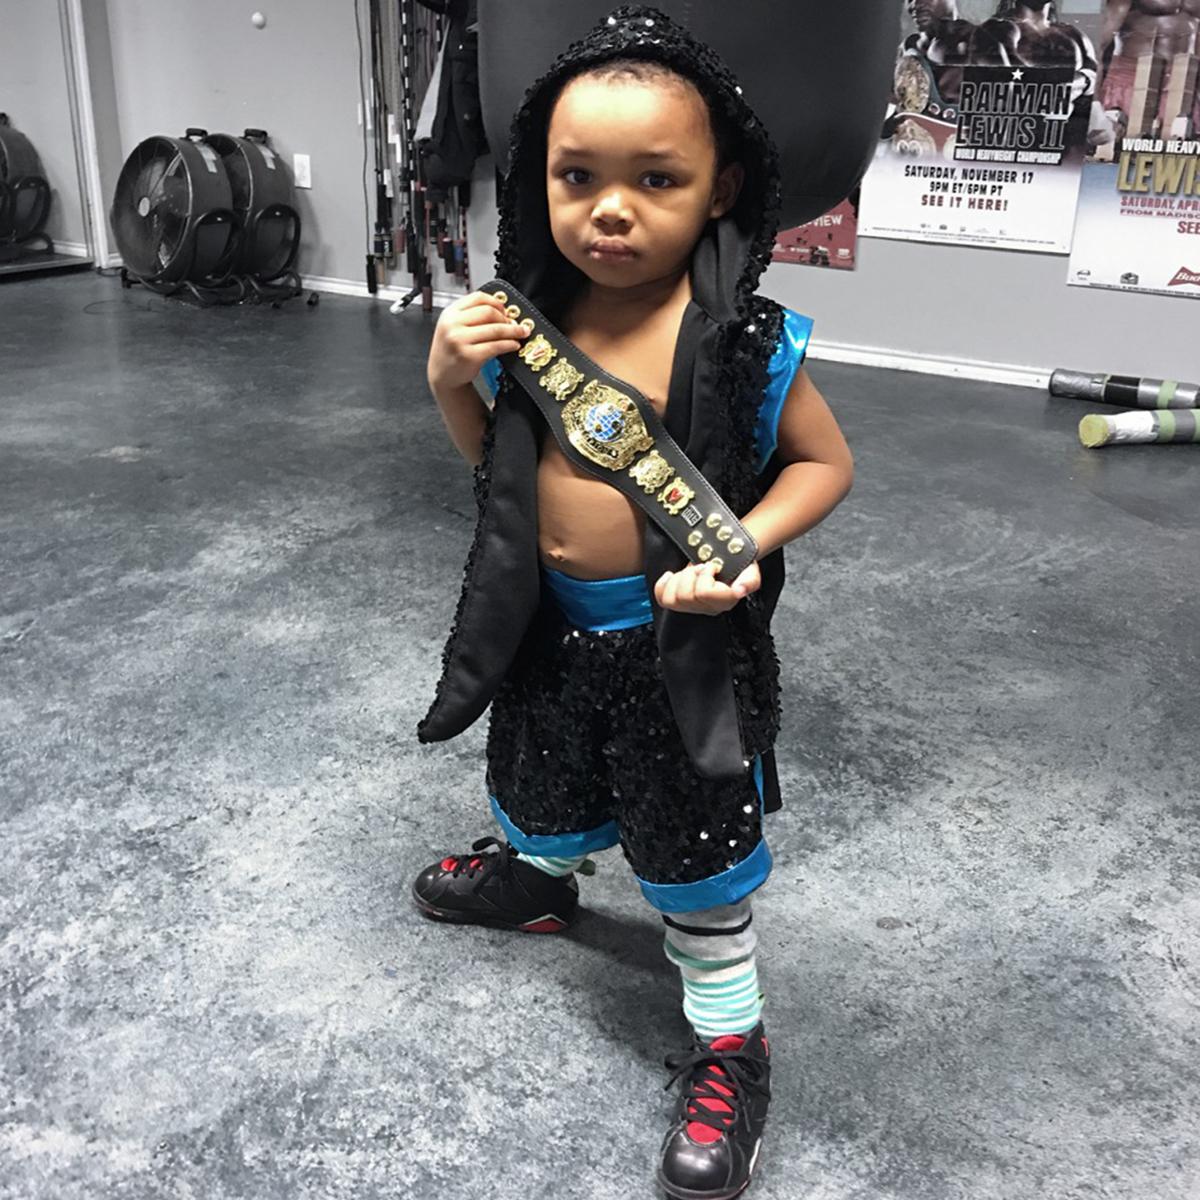 Title Boxing Undisputed Champion Leather Novelty Mini Title Belt - Black 619159360486 | eBay